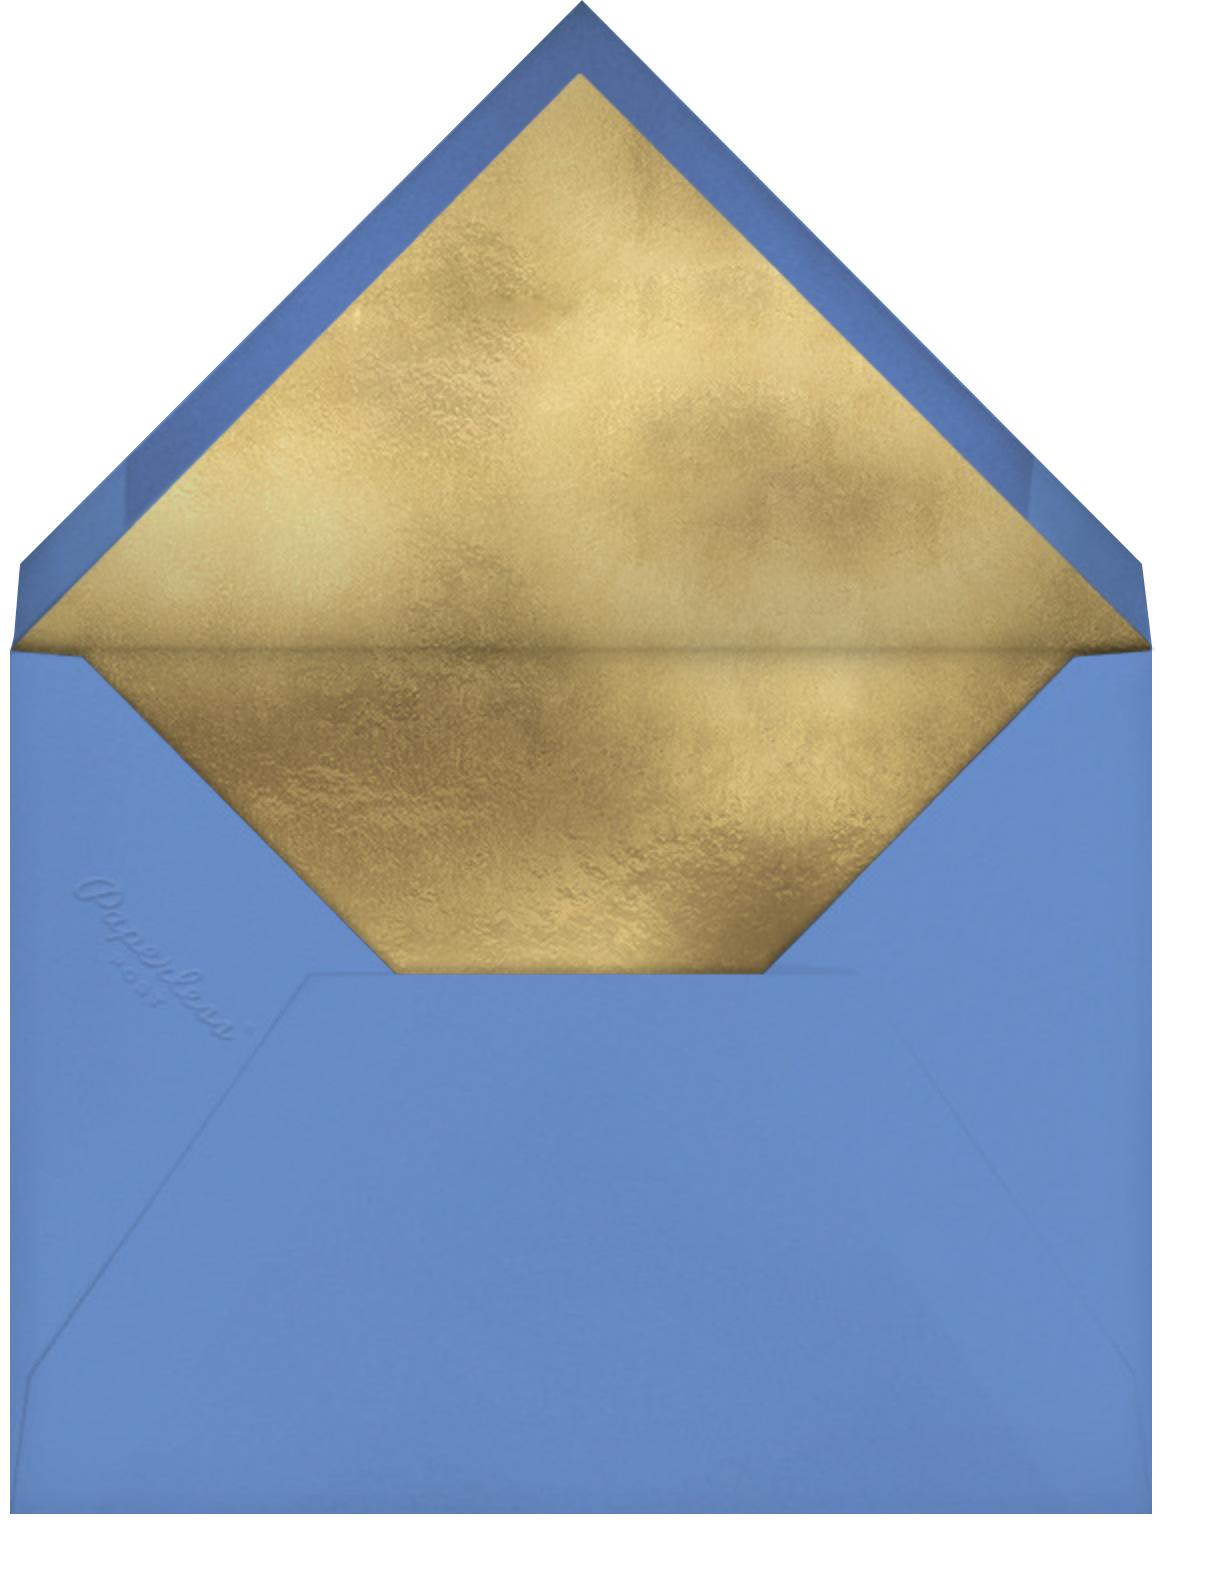 Wrapping Paper Photo - Antwerp - kate spade new york - Hanukkah - envelope back